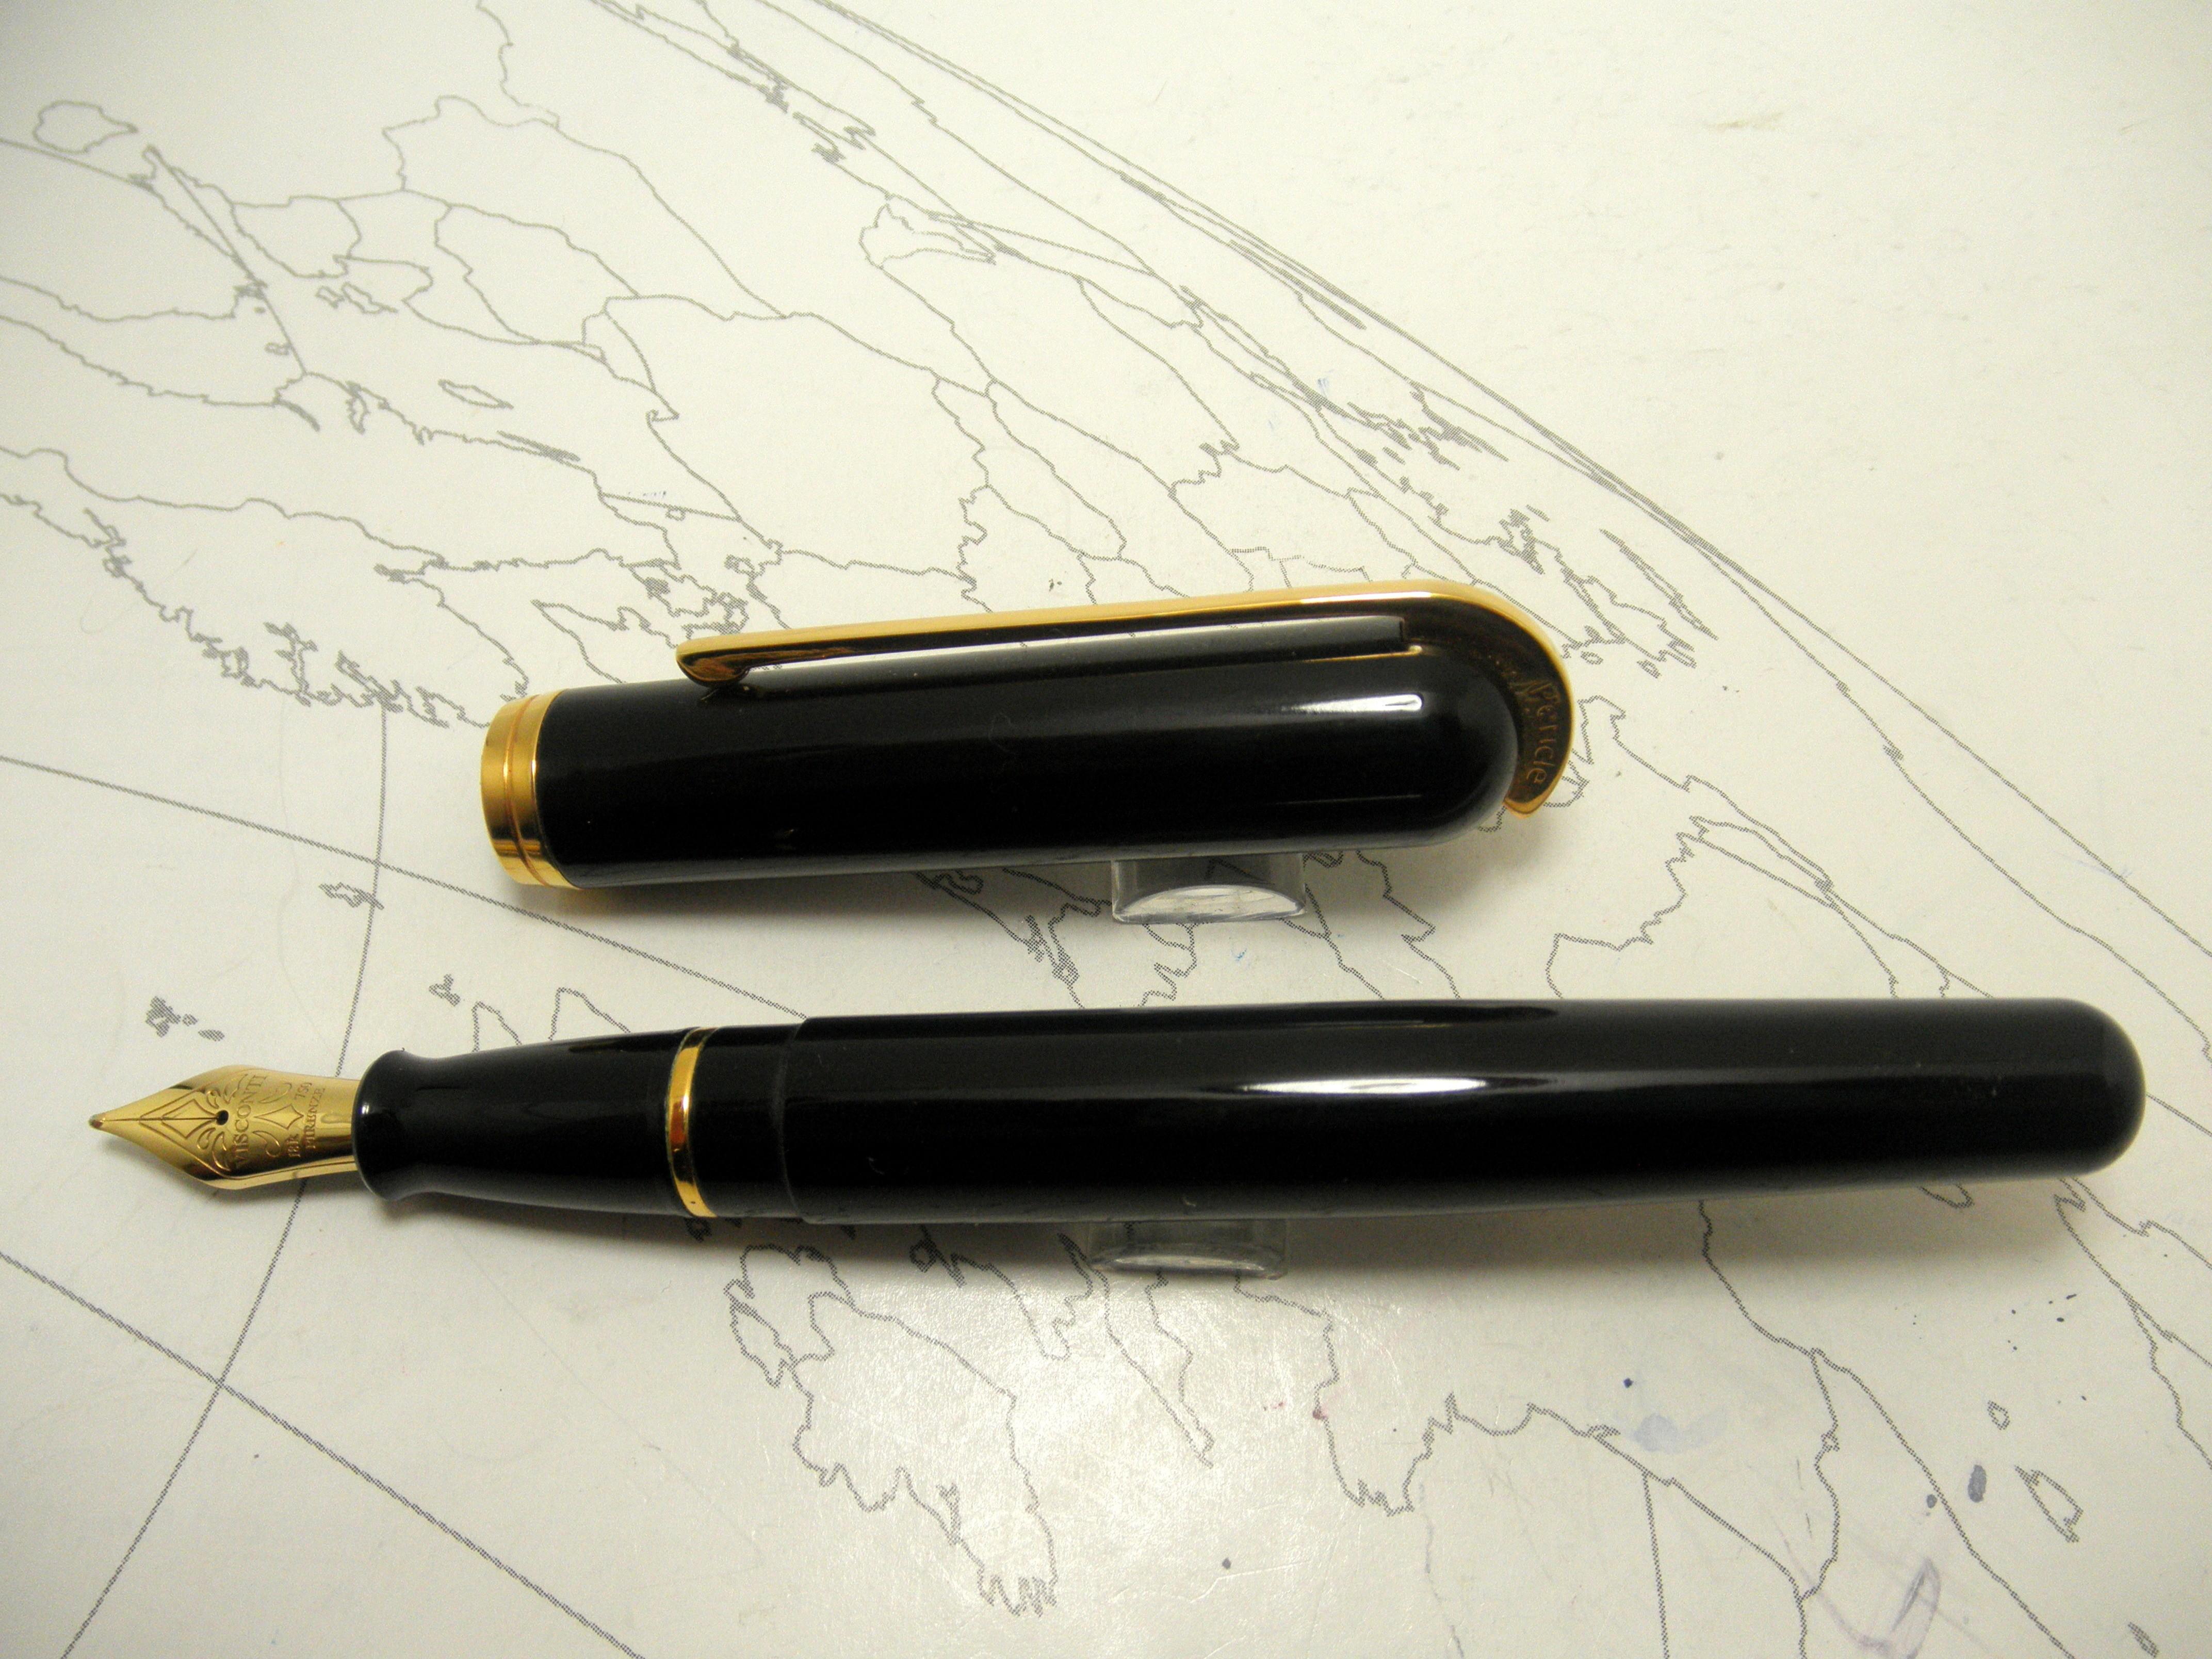 Visconti Pericle Black Visconti Pericle Black Fountain PVisconti Pericle Black Fountain Pen 18k Niben 18k NibFountain Pen 18k Nib